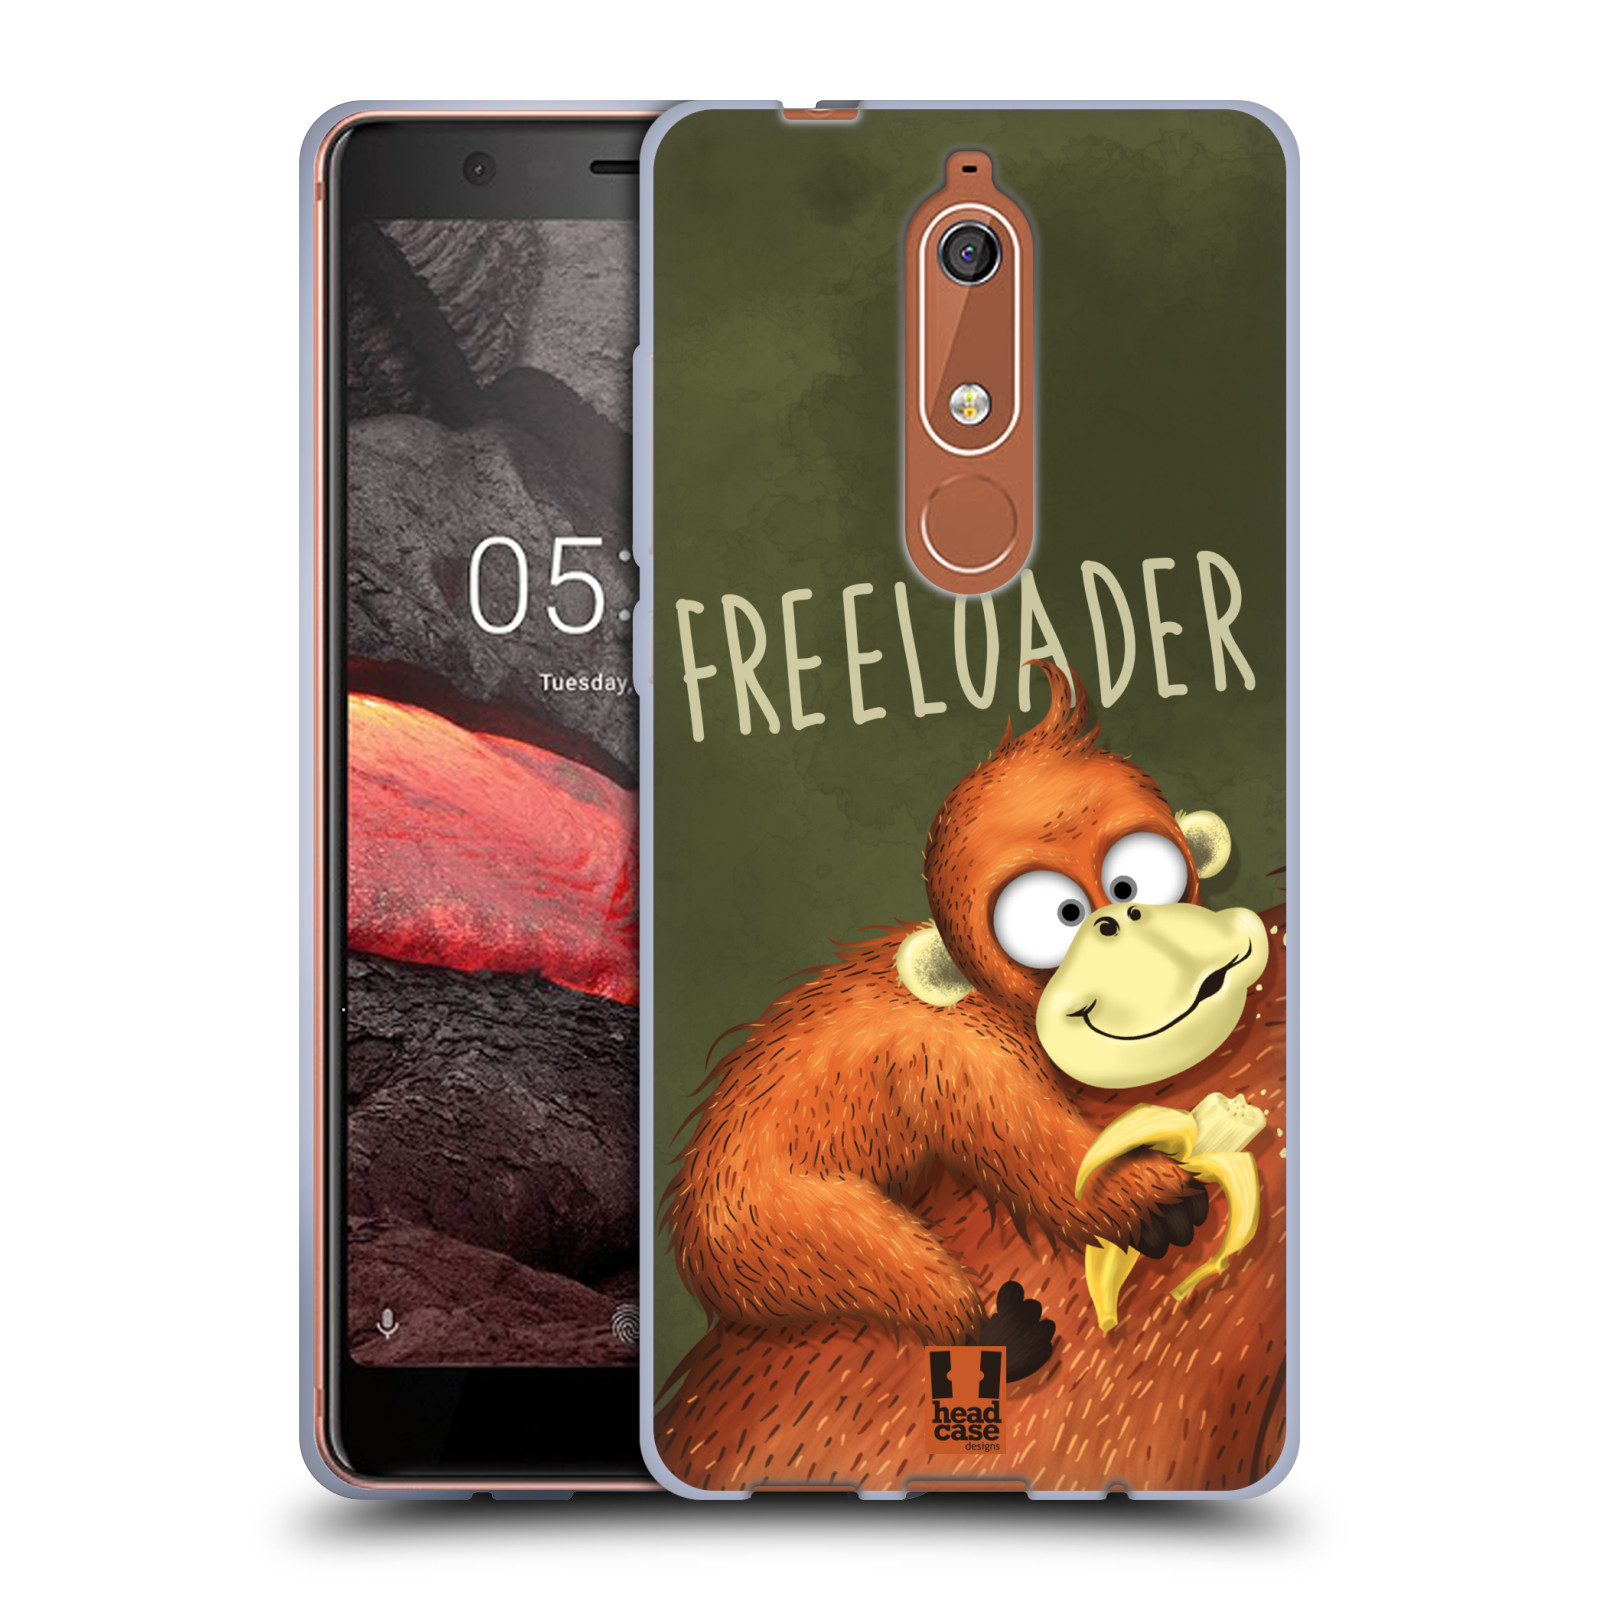 Silikonové pouzdro na mobil Nokia 5.1 - Head Case - Opičák Freeloader